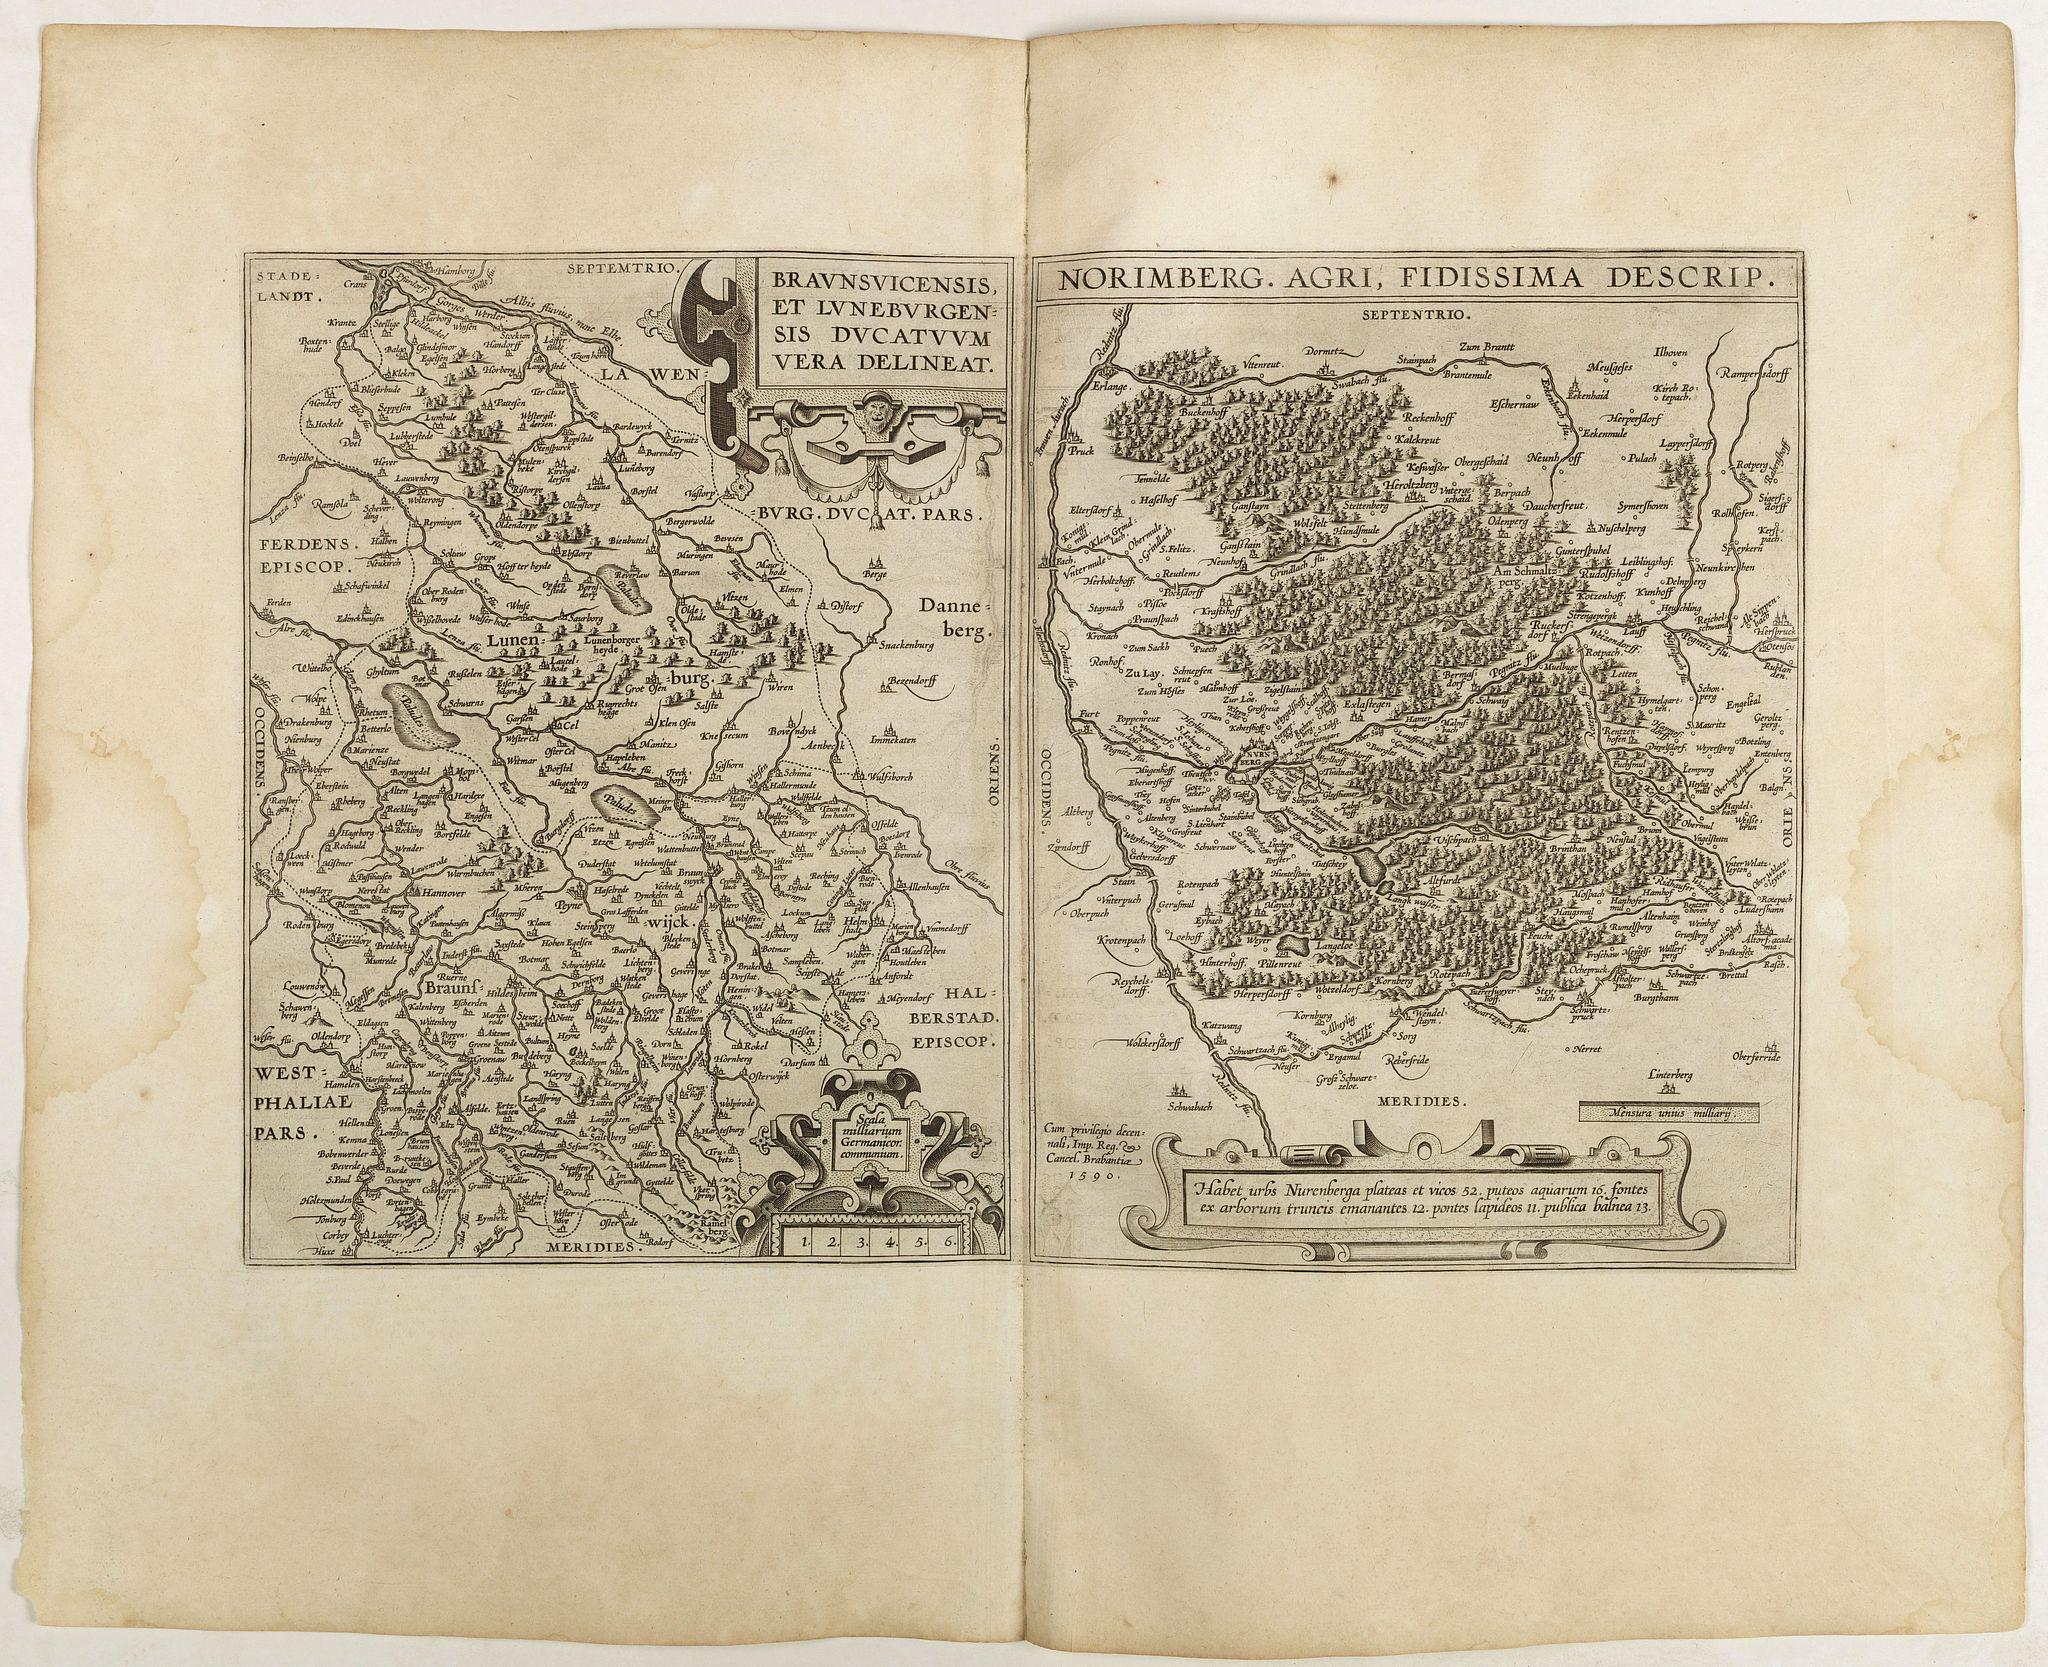 ORTELIUS, A. -  Braunsvicensis et Luneburgensis . . . (together with) Norimberg Agri,..